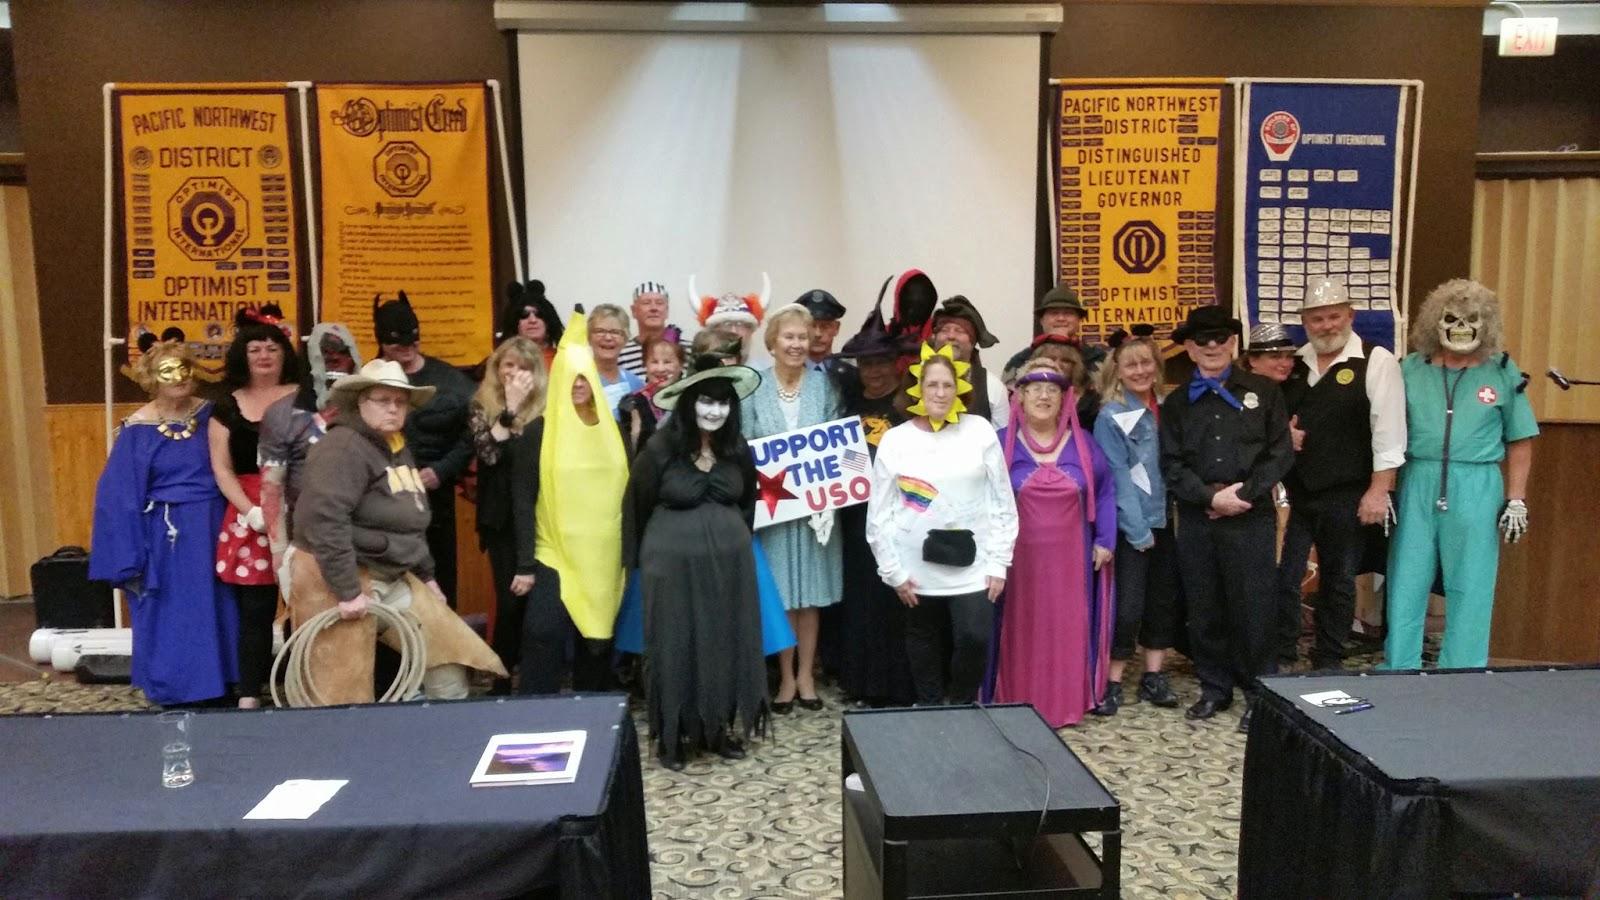 pnw district optimist clubs costume party